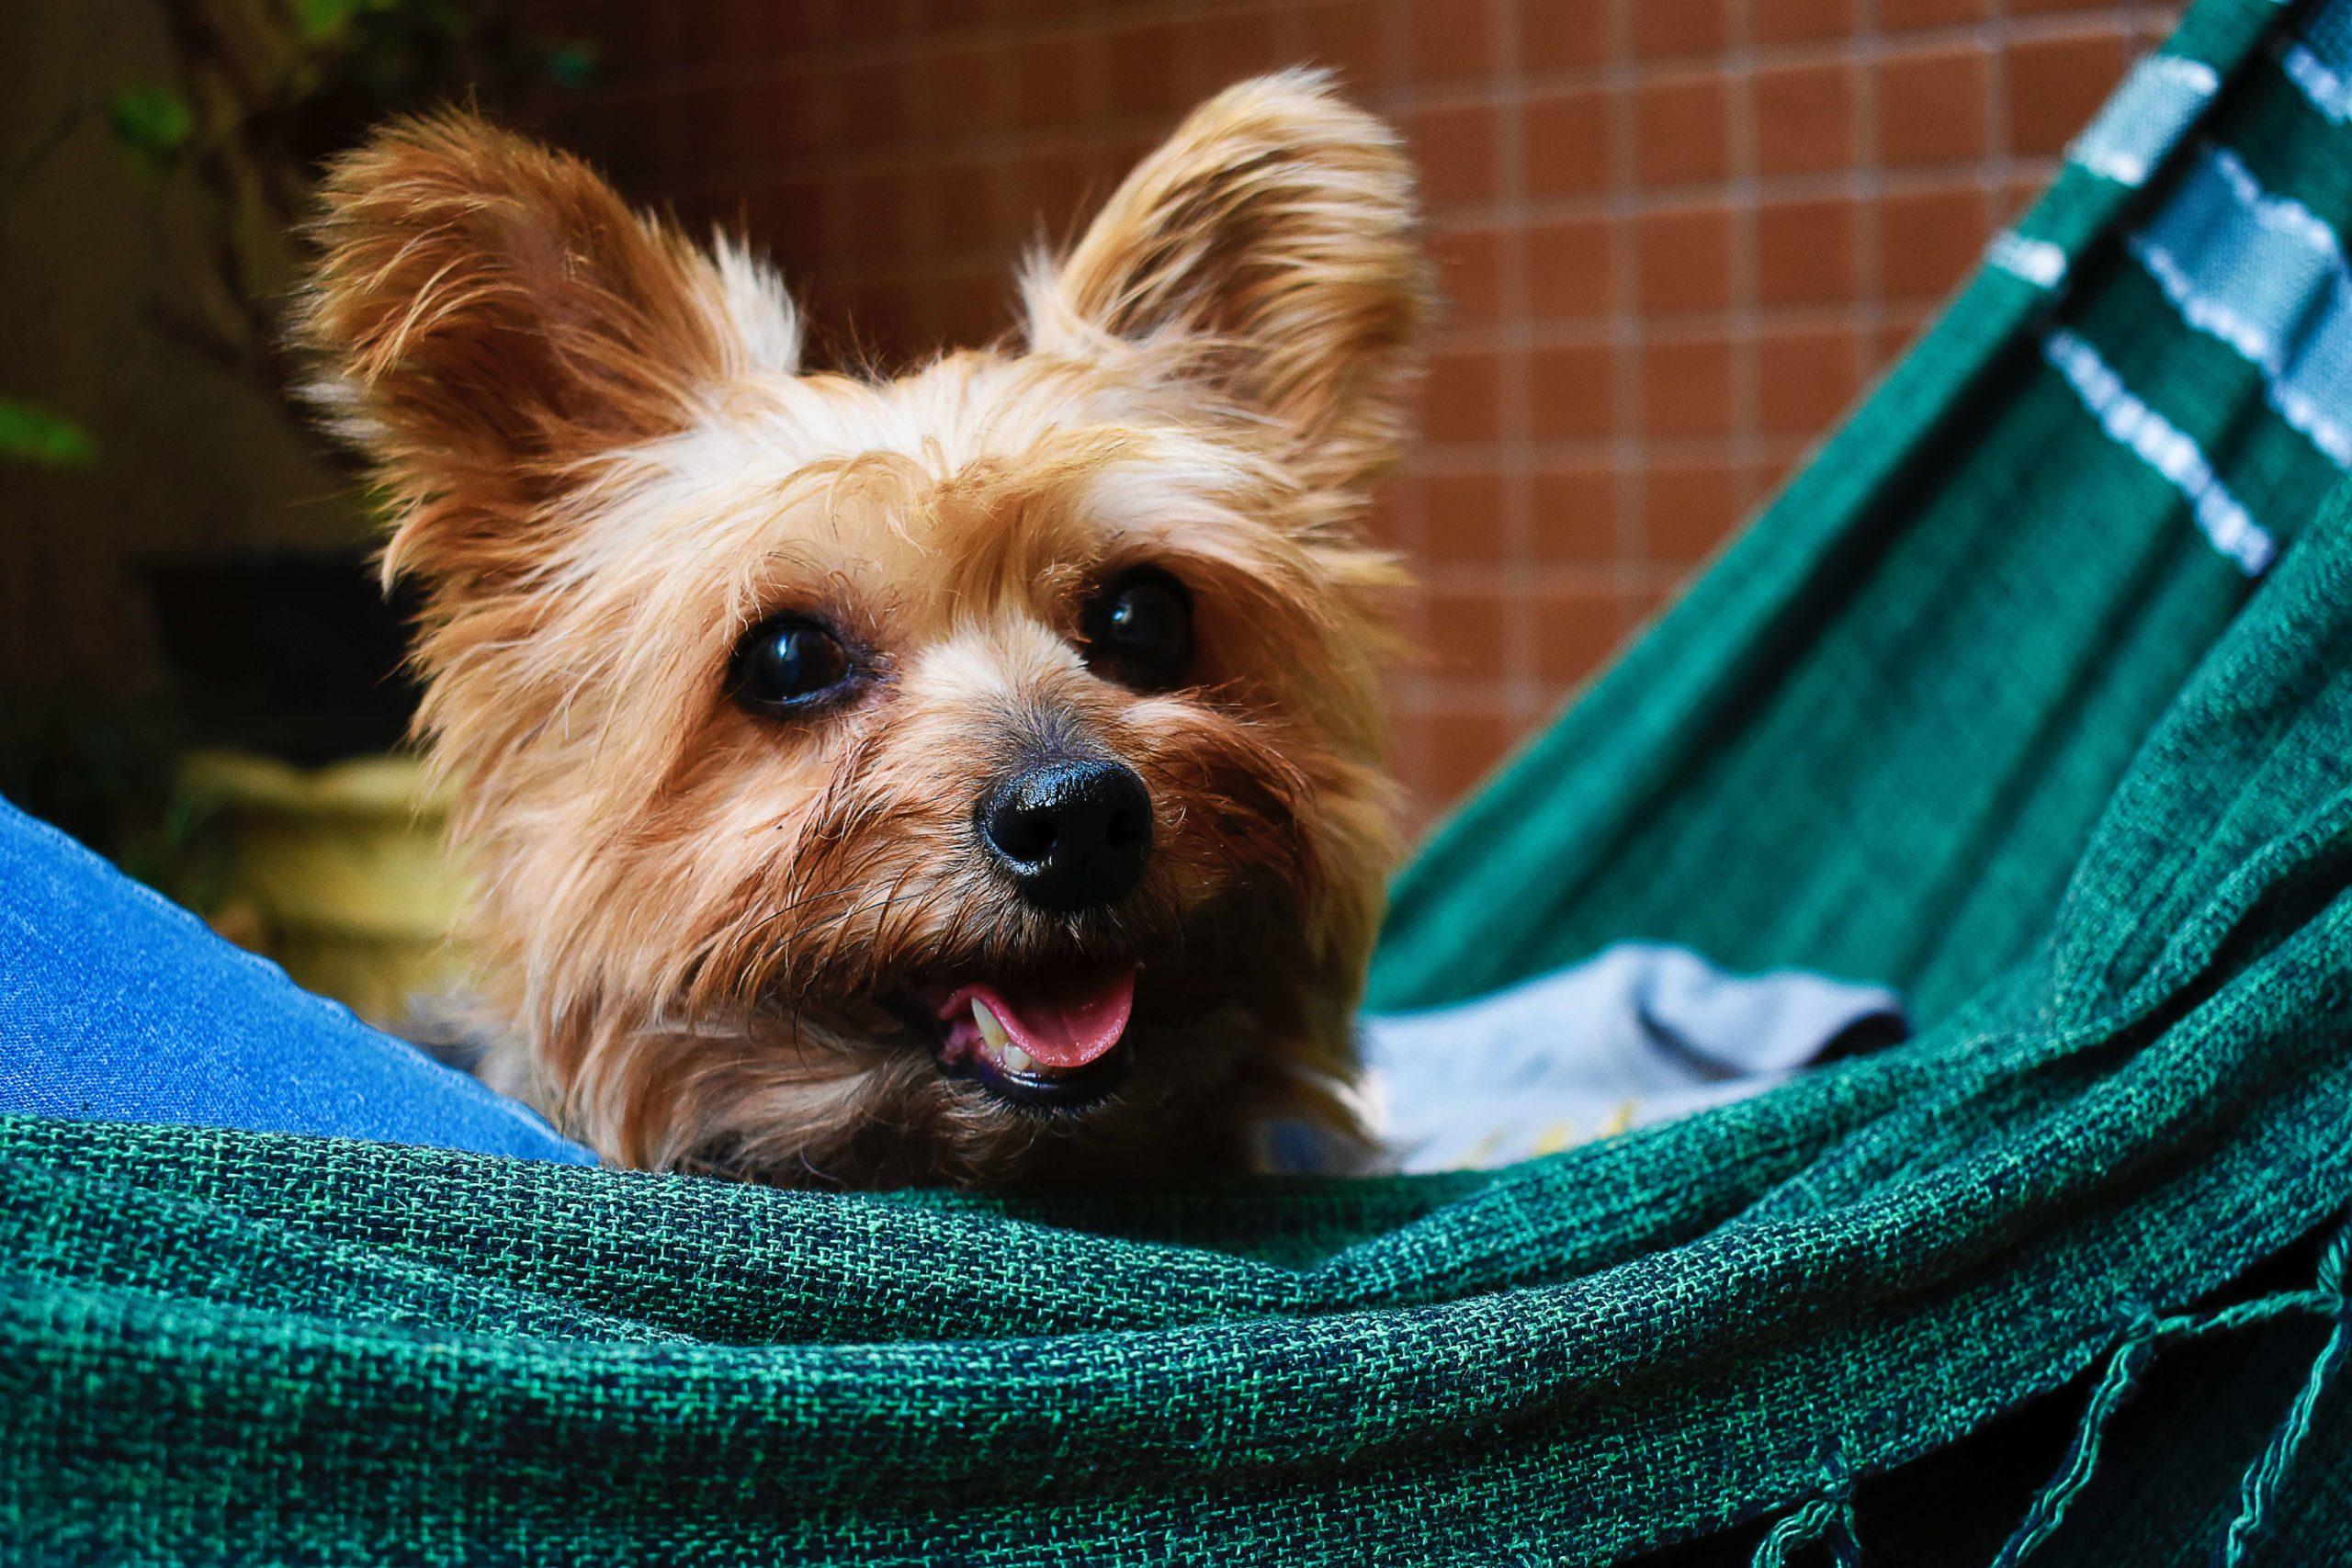 Pet Insurance with No Reimbursement